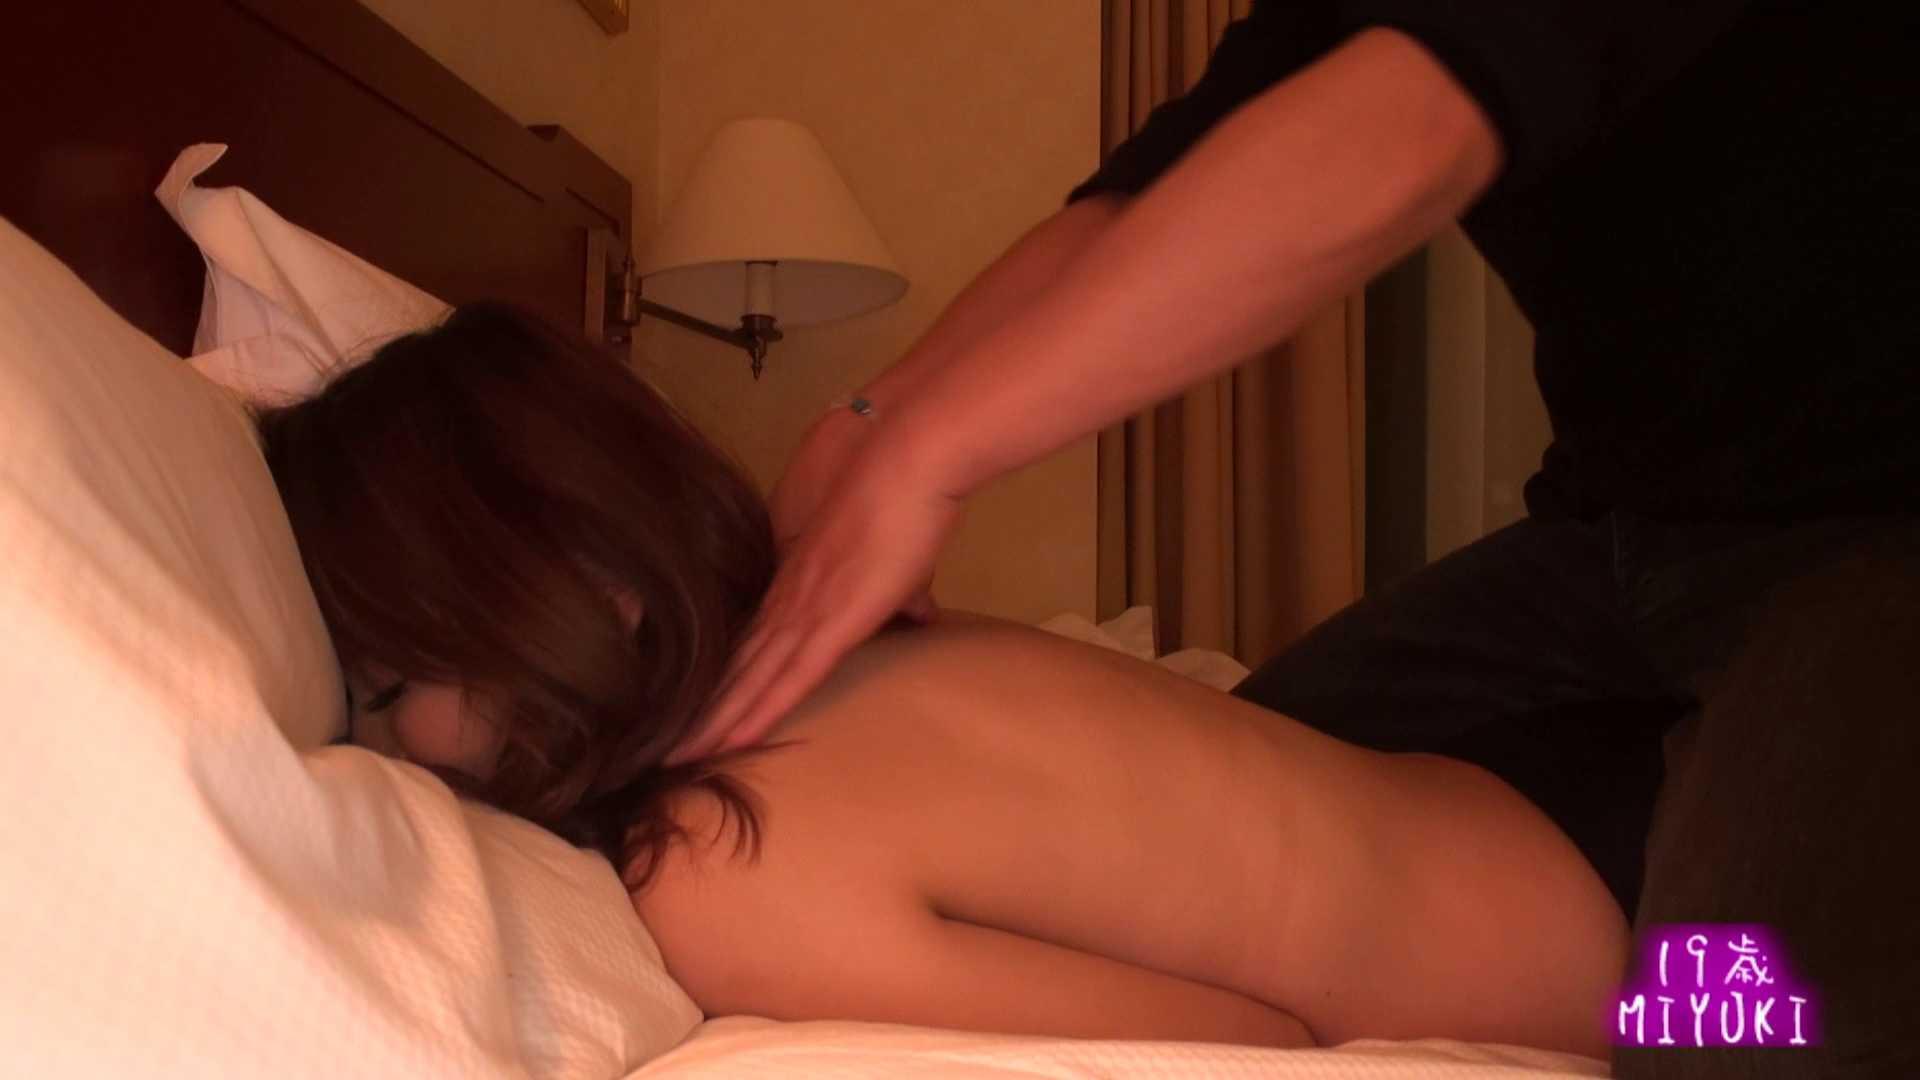 MIYUKIちゃんに男優さんがエロマッサージ マッサージ セックス画像 104pic 65